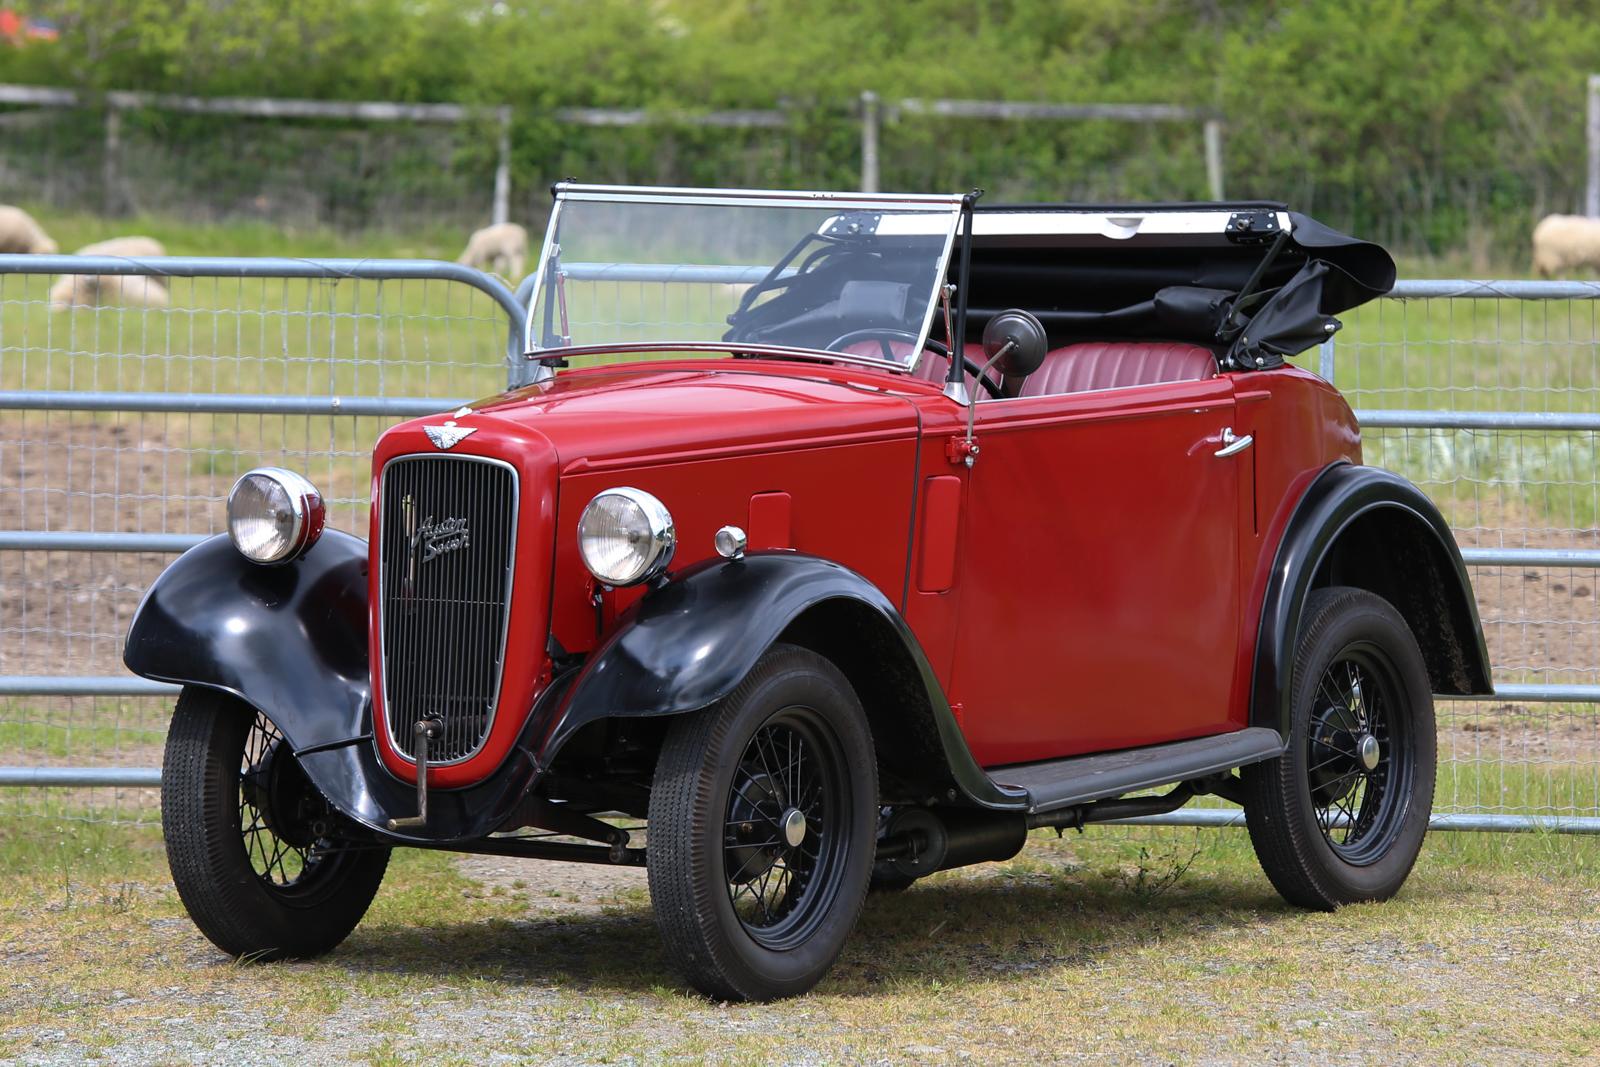 E B also Austin Seven S likewise Dsc likewise D C Fca B C E D A B D together with Px Austin Two Seater. on austin seven opal tourer